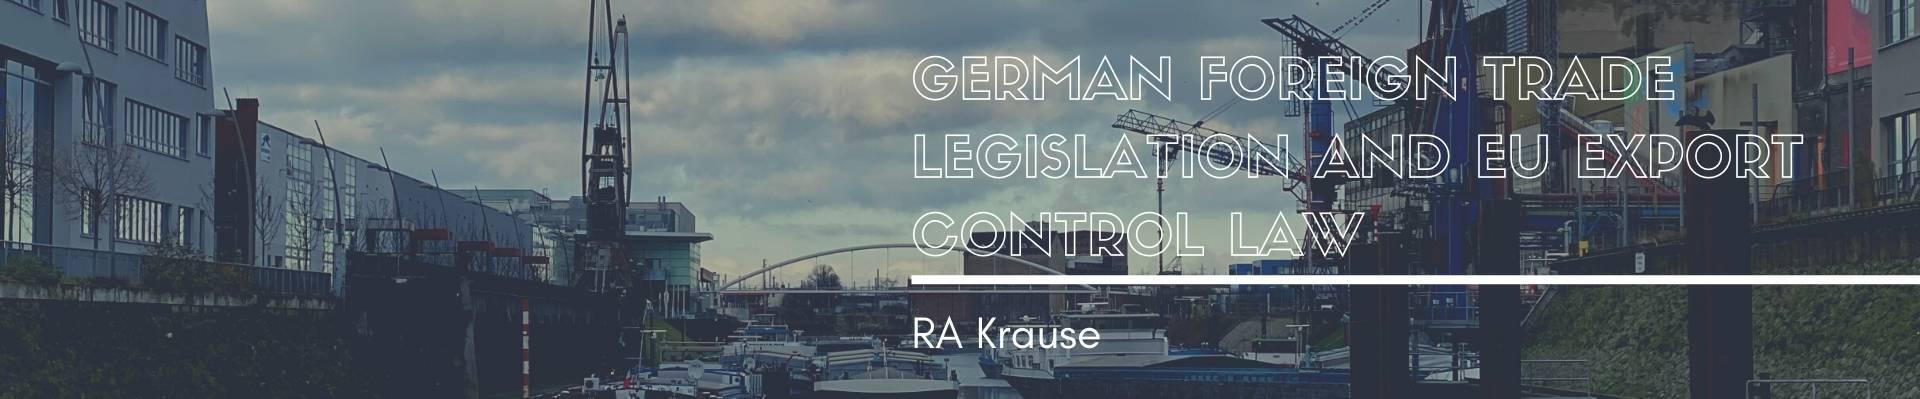 German Foreign Trade Legislation and EU Export Control Law